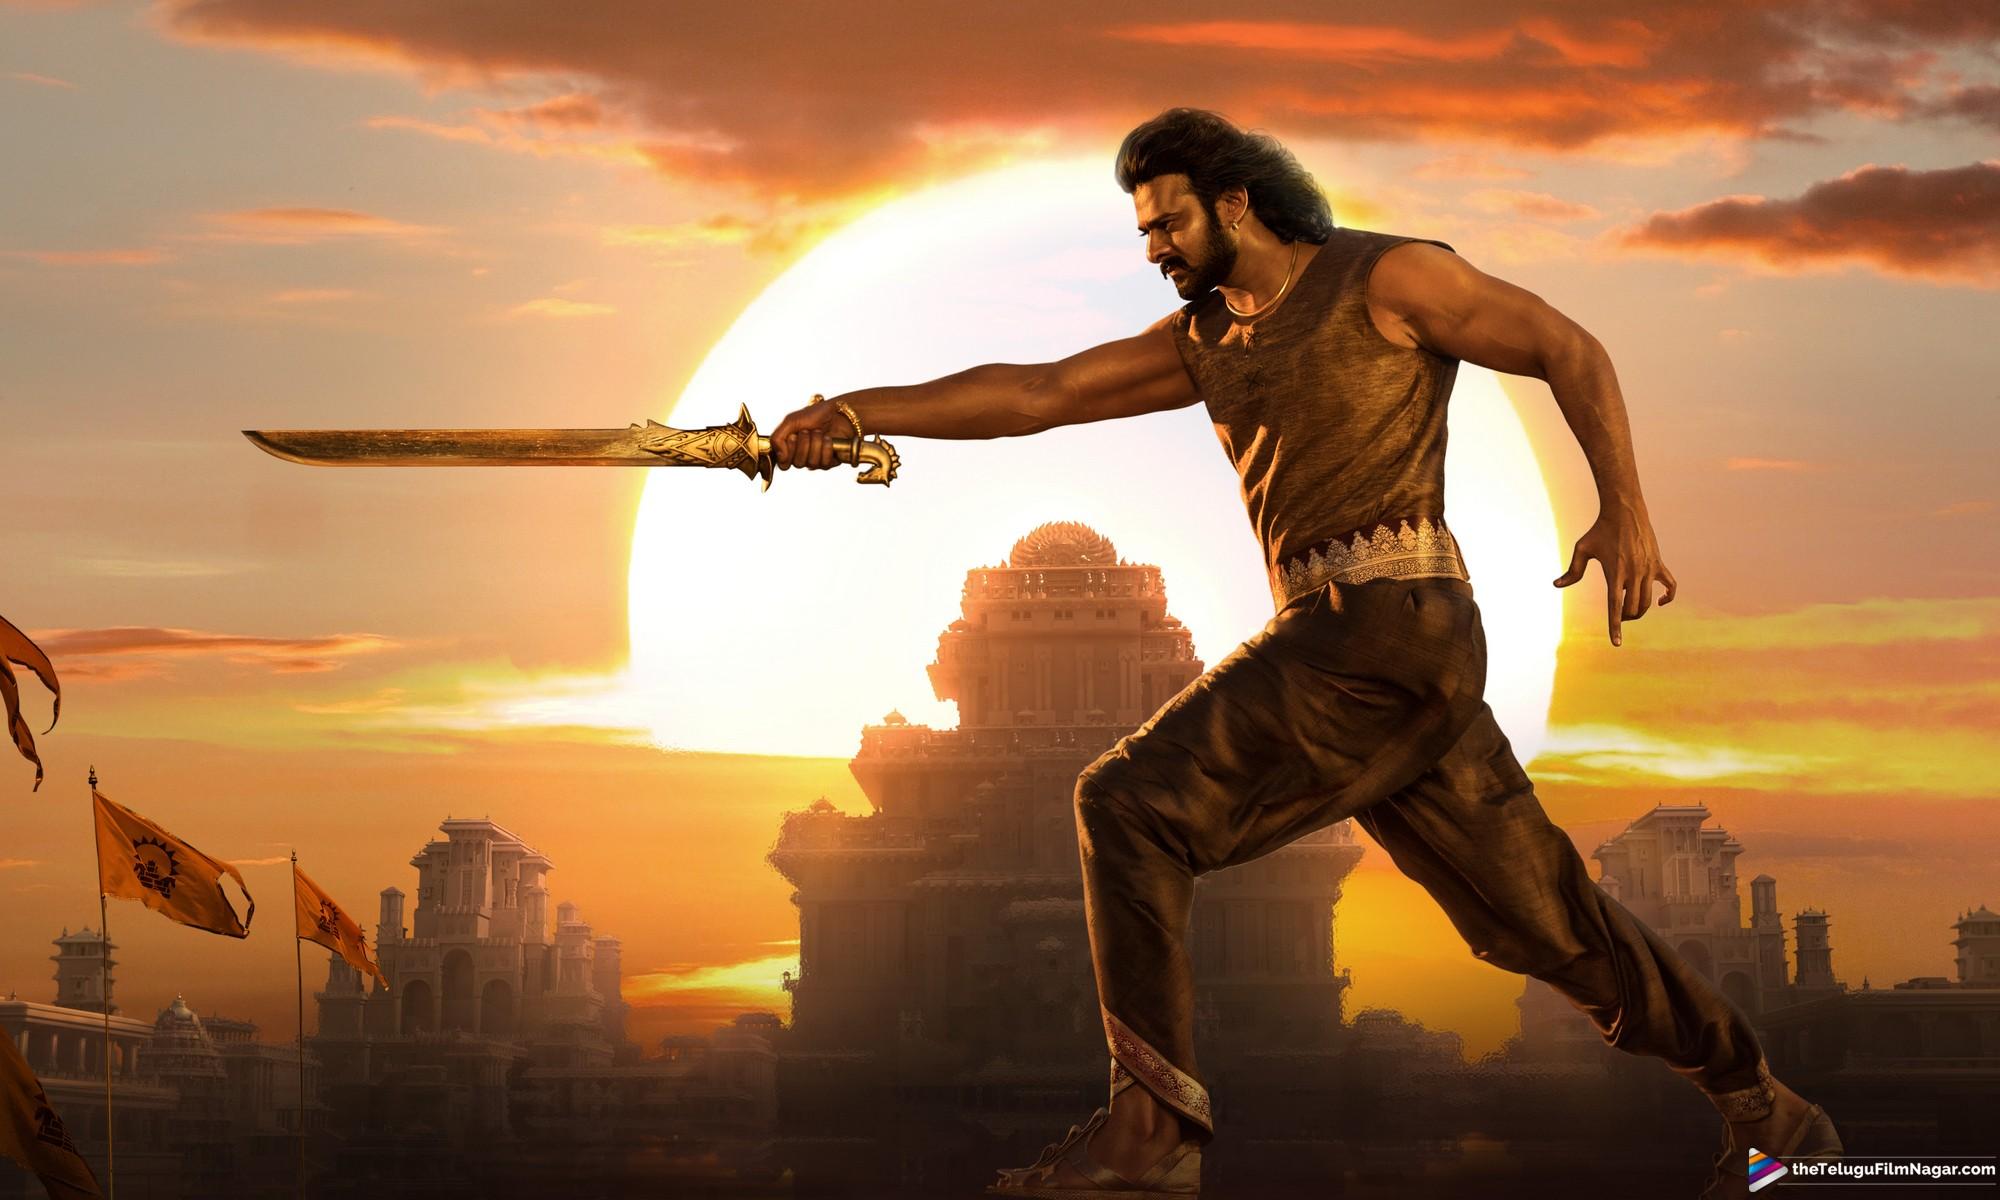 Prabhakaran Hd Wallpapers Bahubali Full Movie Hd Sientalyric